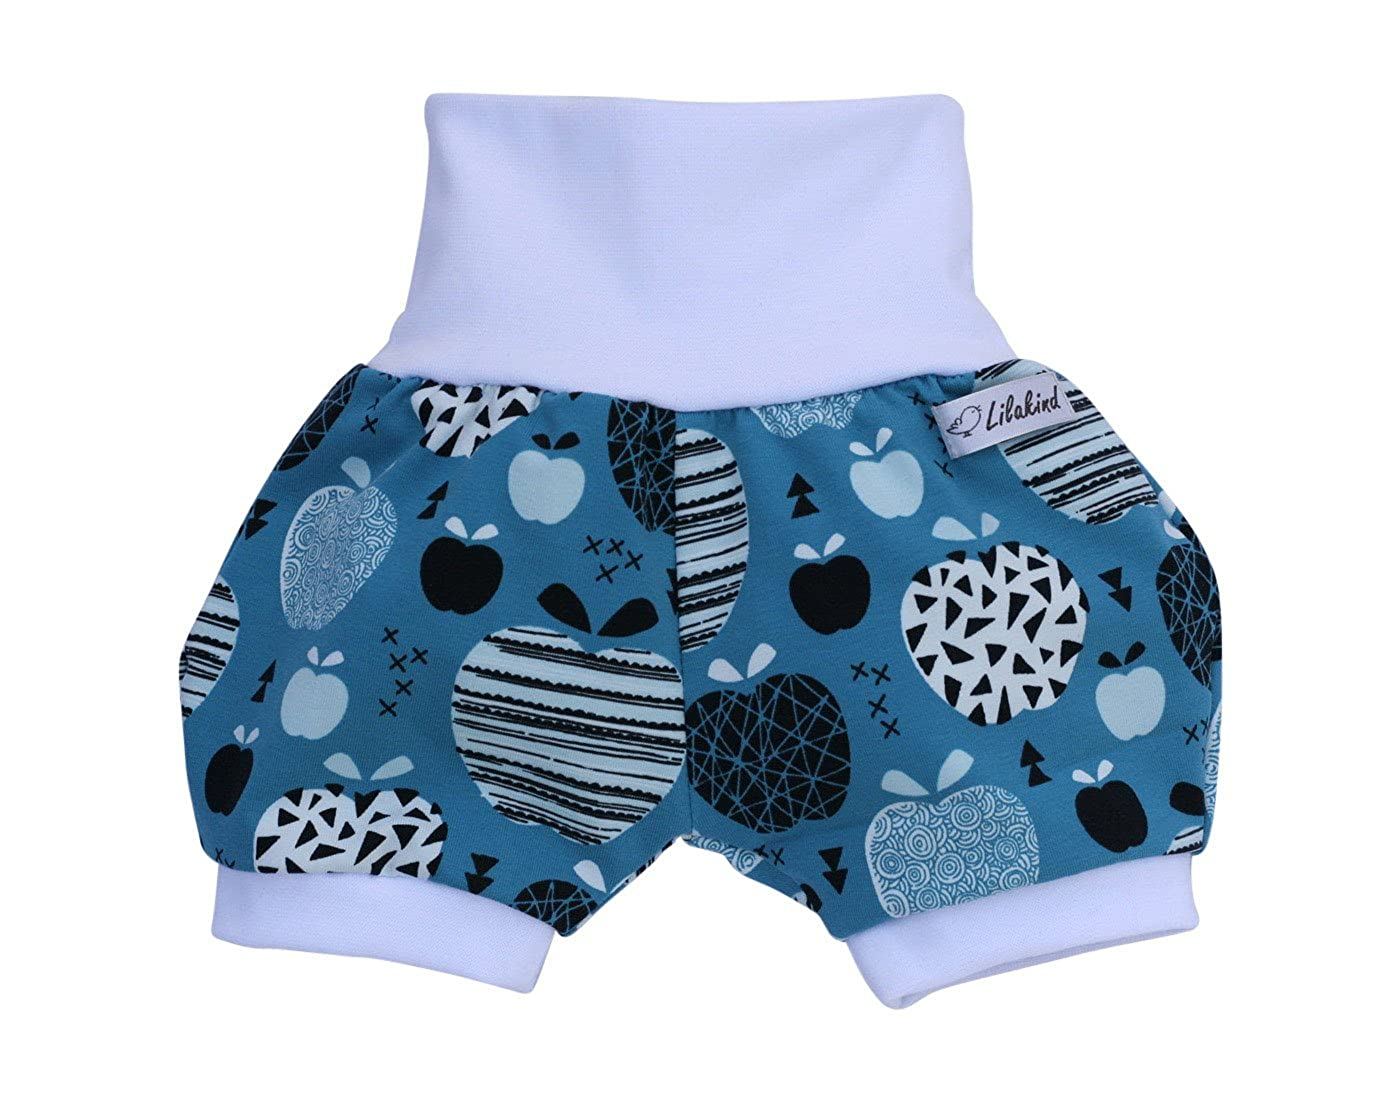 Lilakind Kurze Pumphose Shorts Buxe Sommerhose Prinzessin Motiv